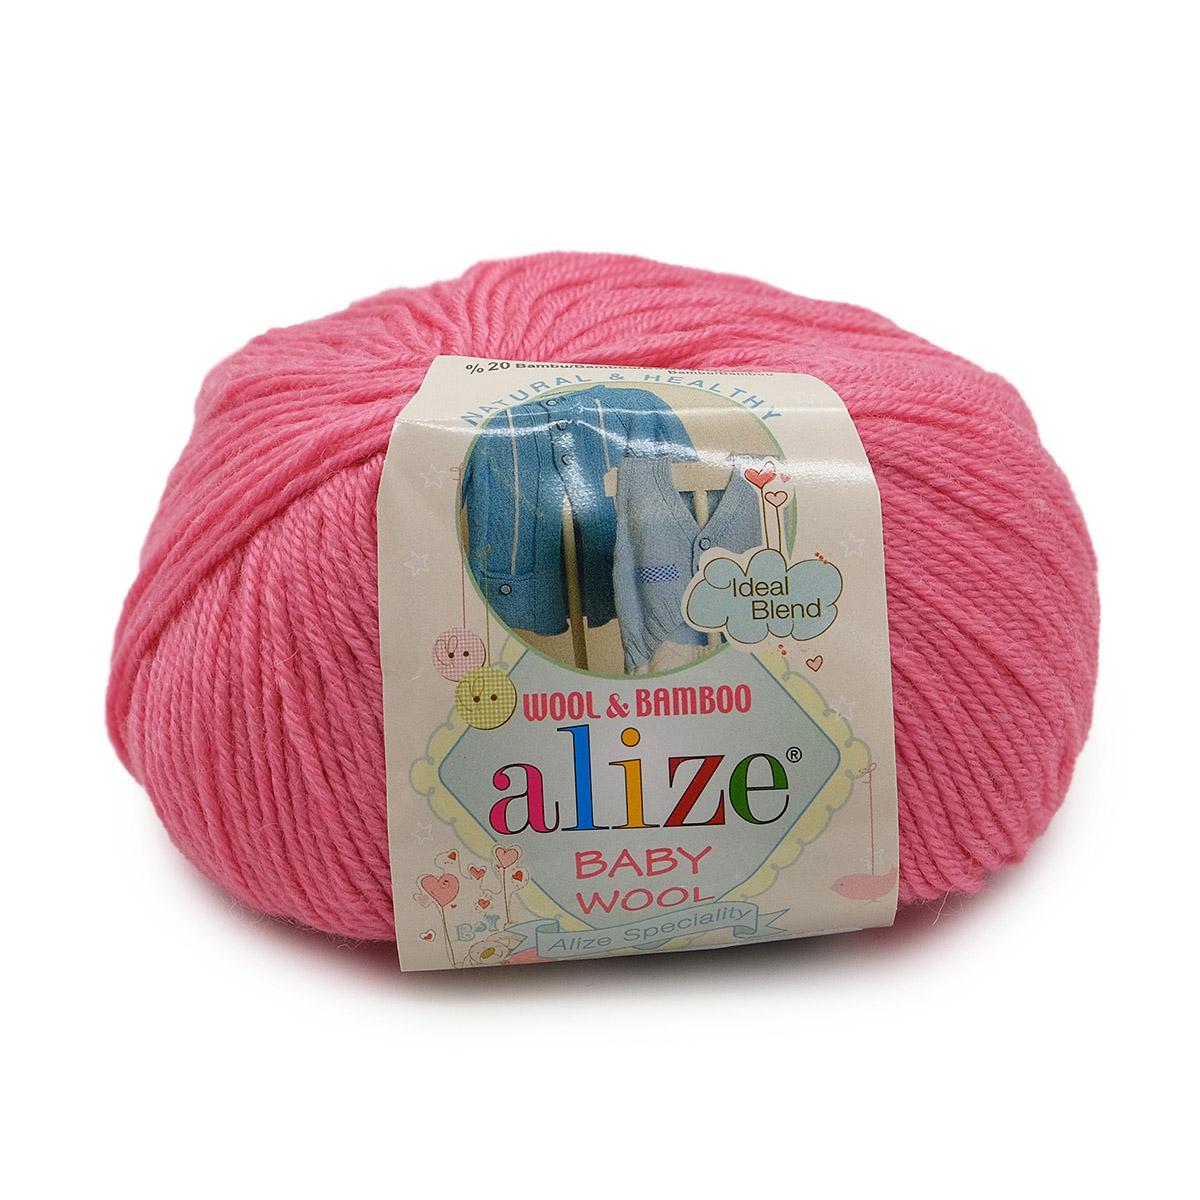 Пряжа ALIZE 'Baby wool' 50гр. 175м. (20%бамбук, 40%шерсть, 40%акрил)ТУ